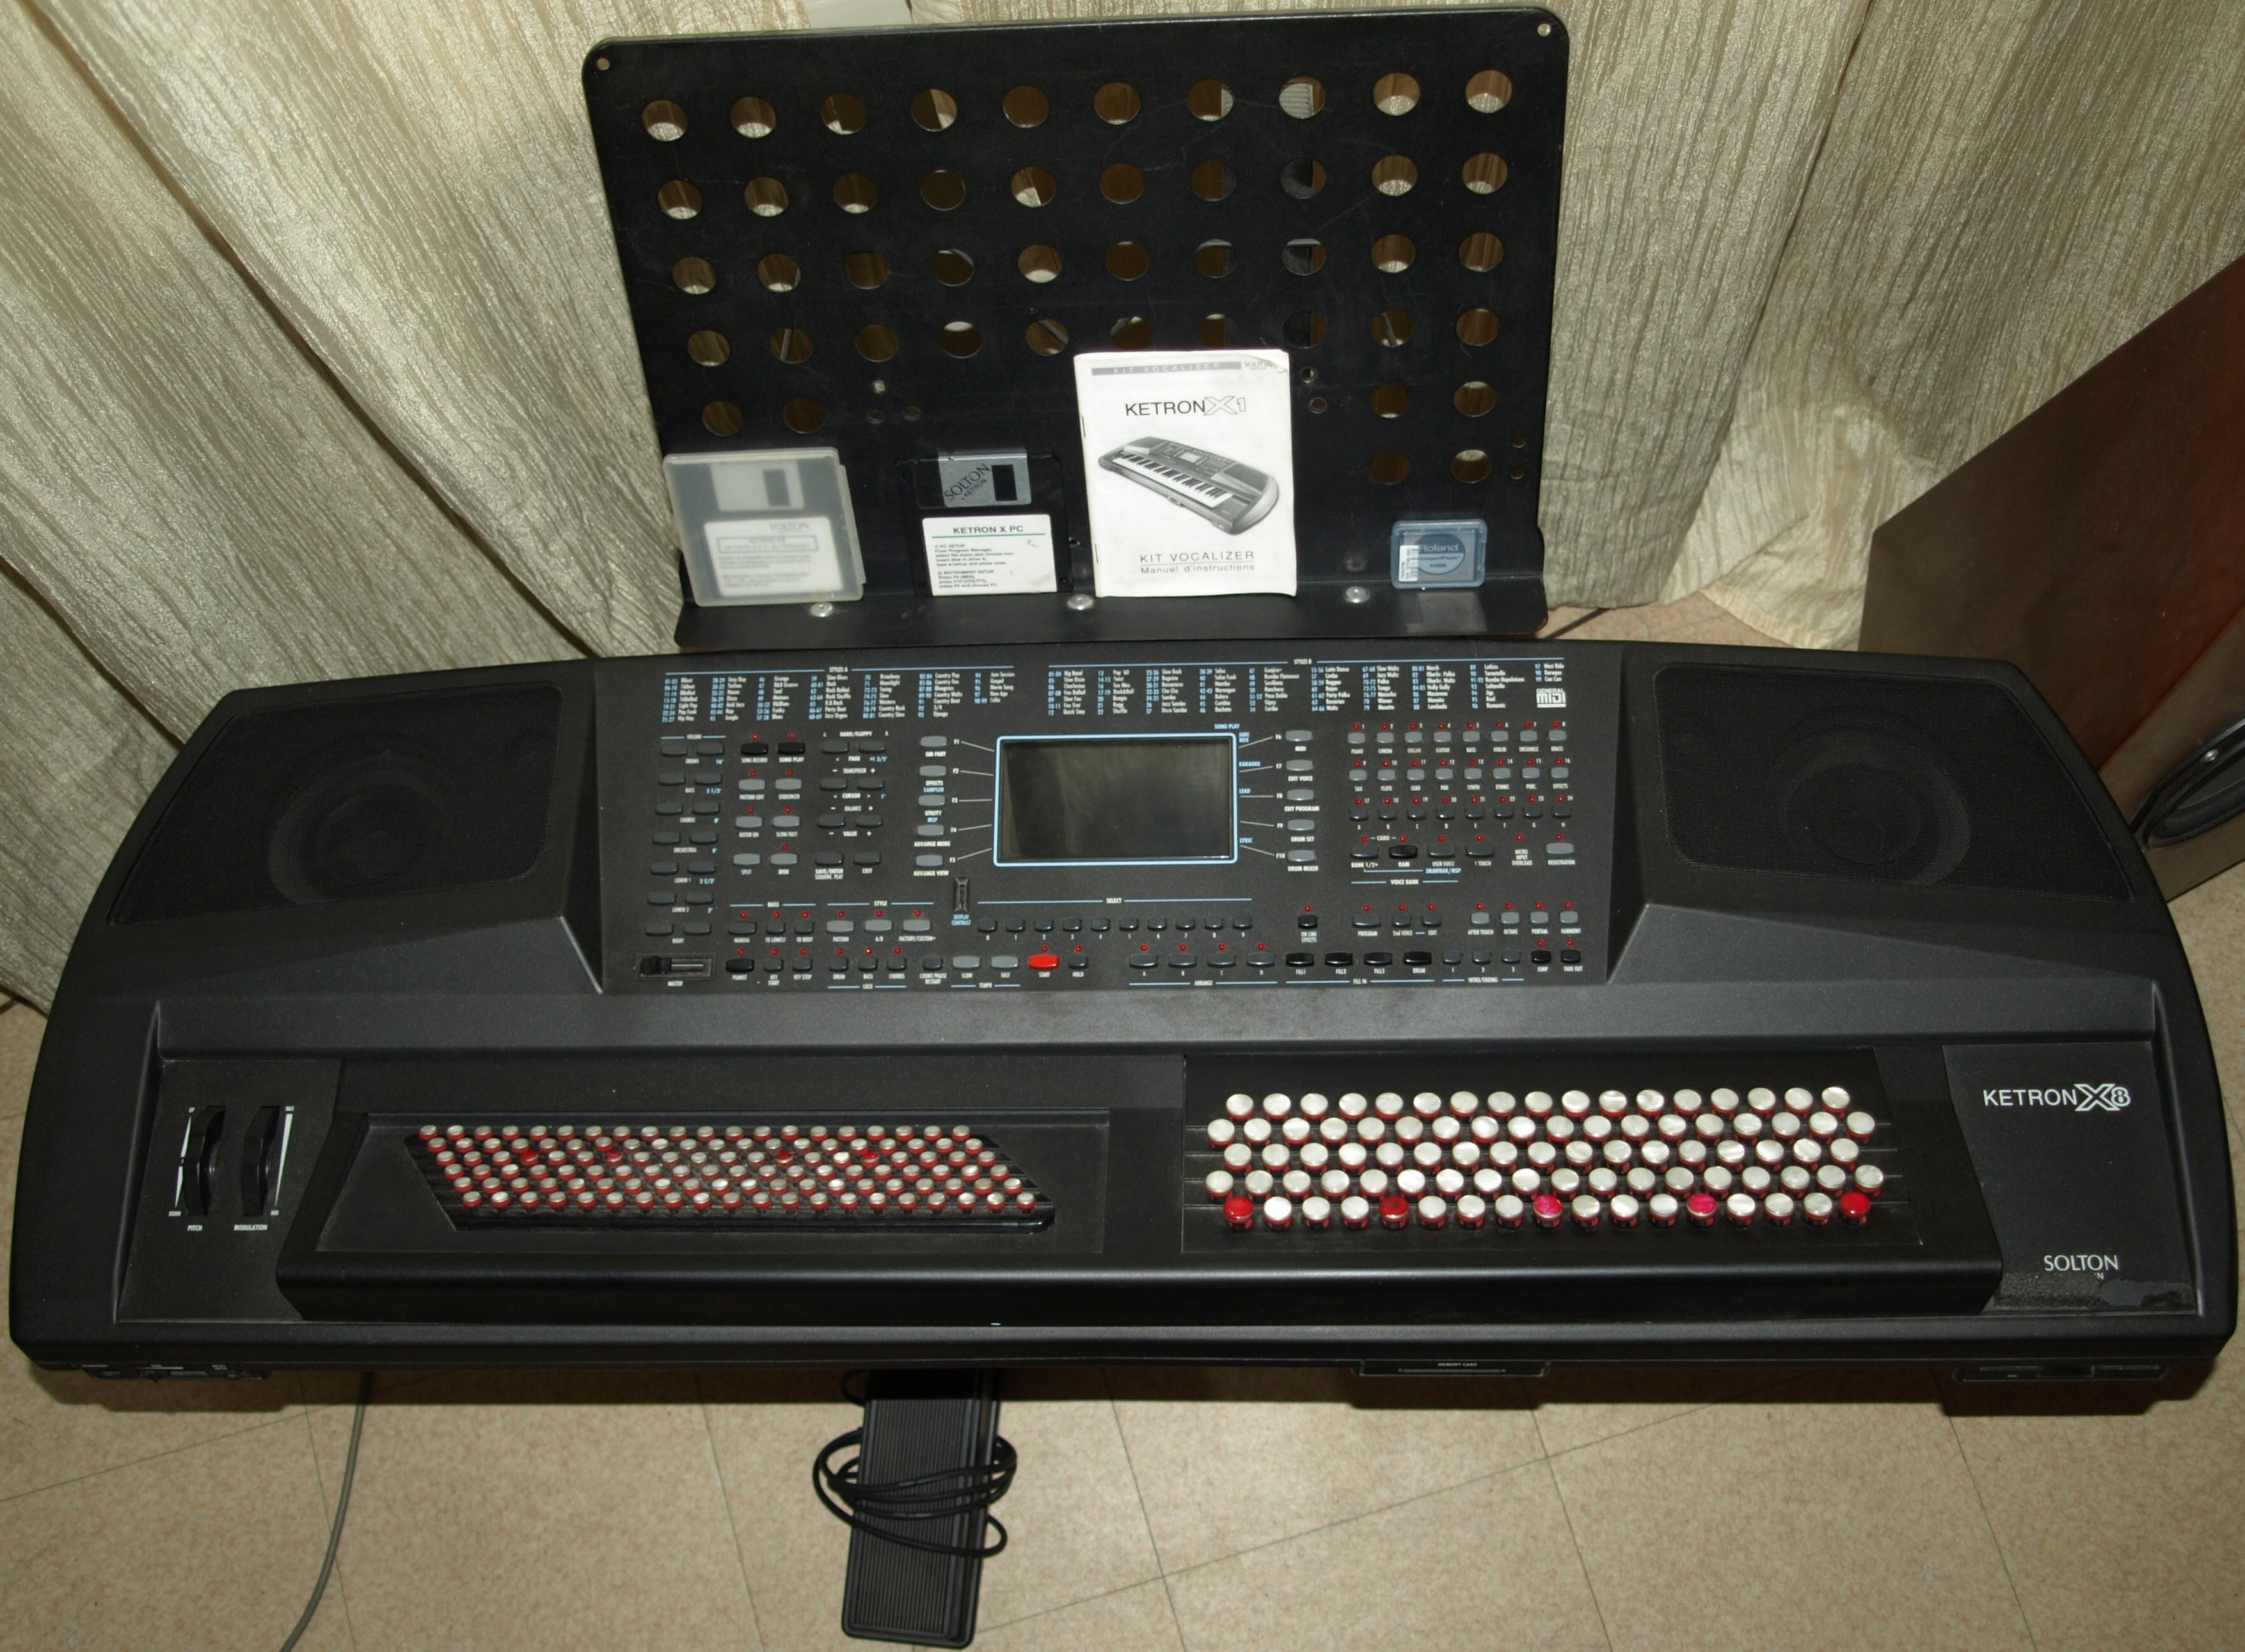 ketron x8 hd image 603553 audiofanzine. Black Bedroom Furniture Sets. Home Design Ideas